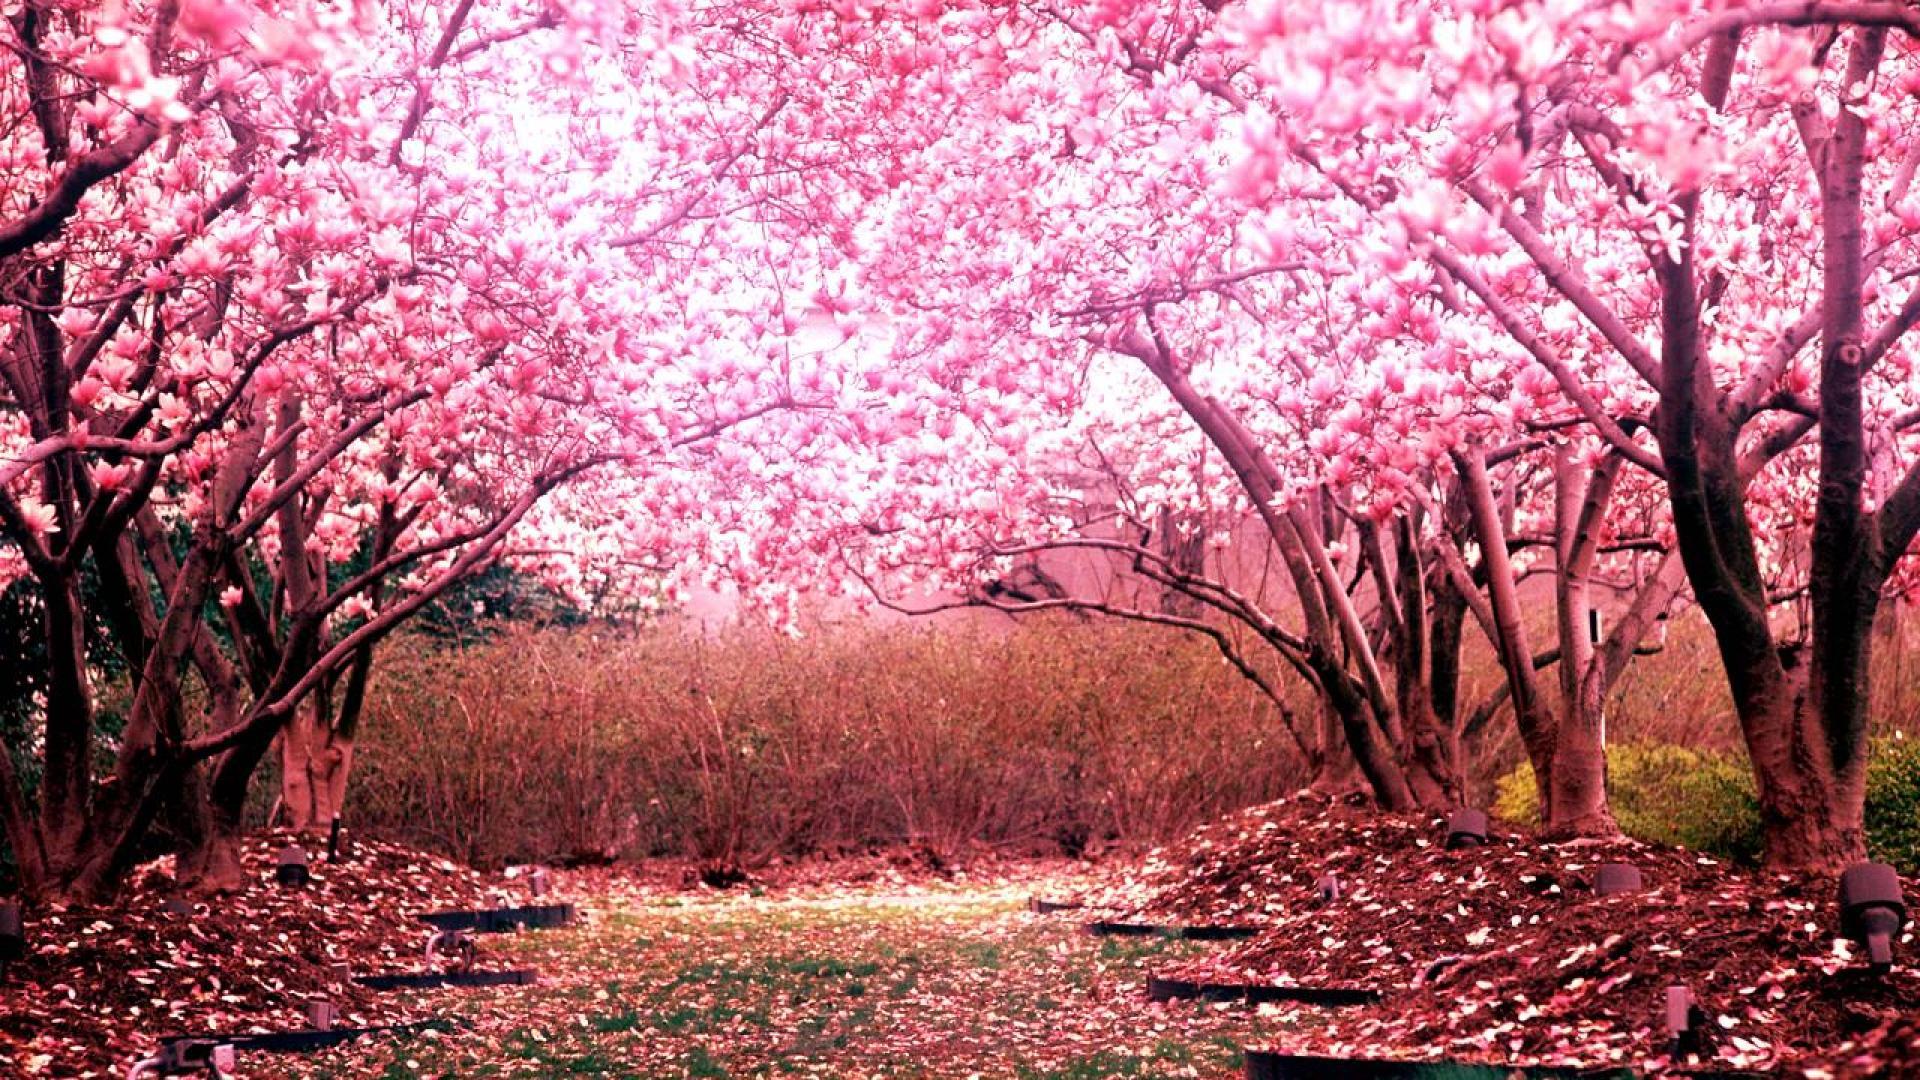 Cherry Blossom Tree Desktop Background HD 1920x1080 deskbgcom 1920x1080